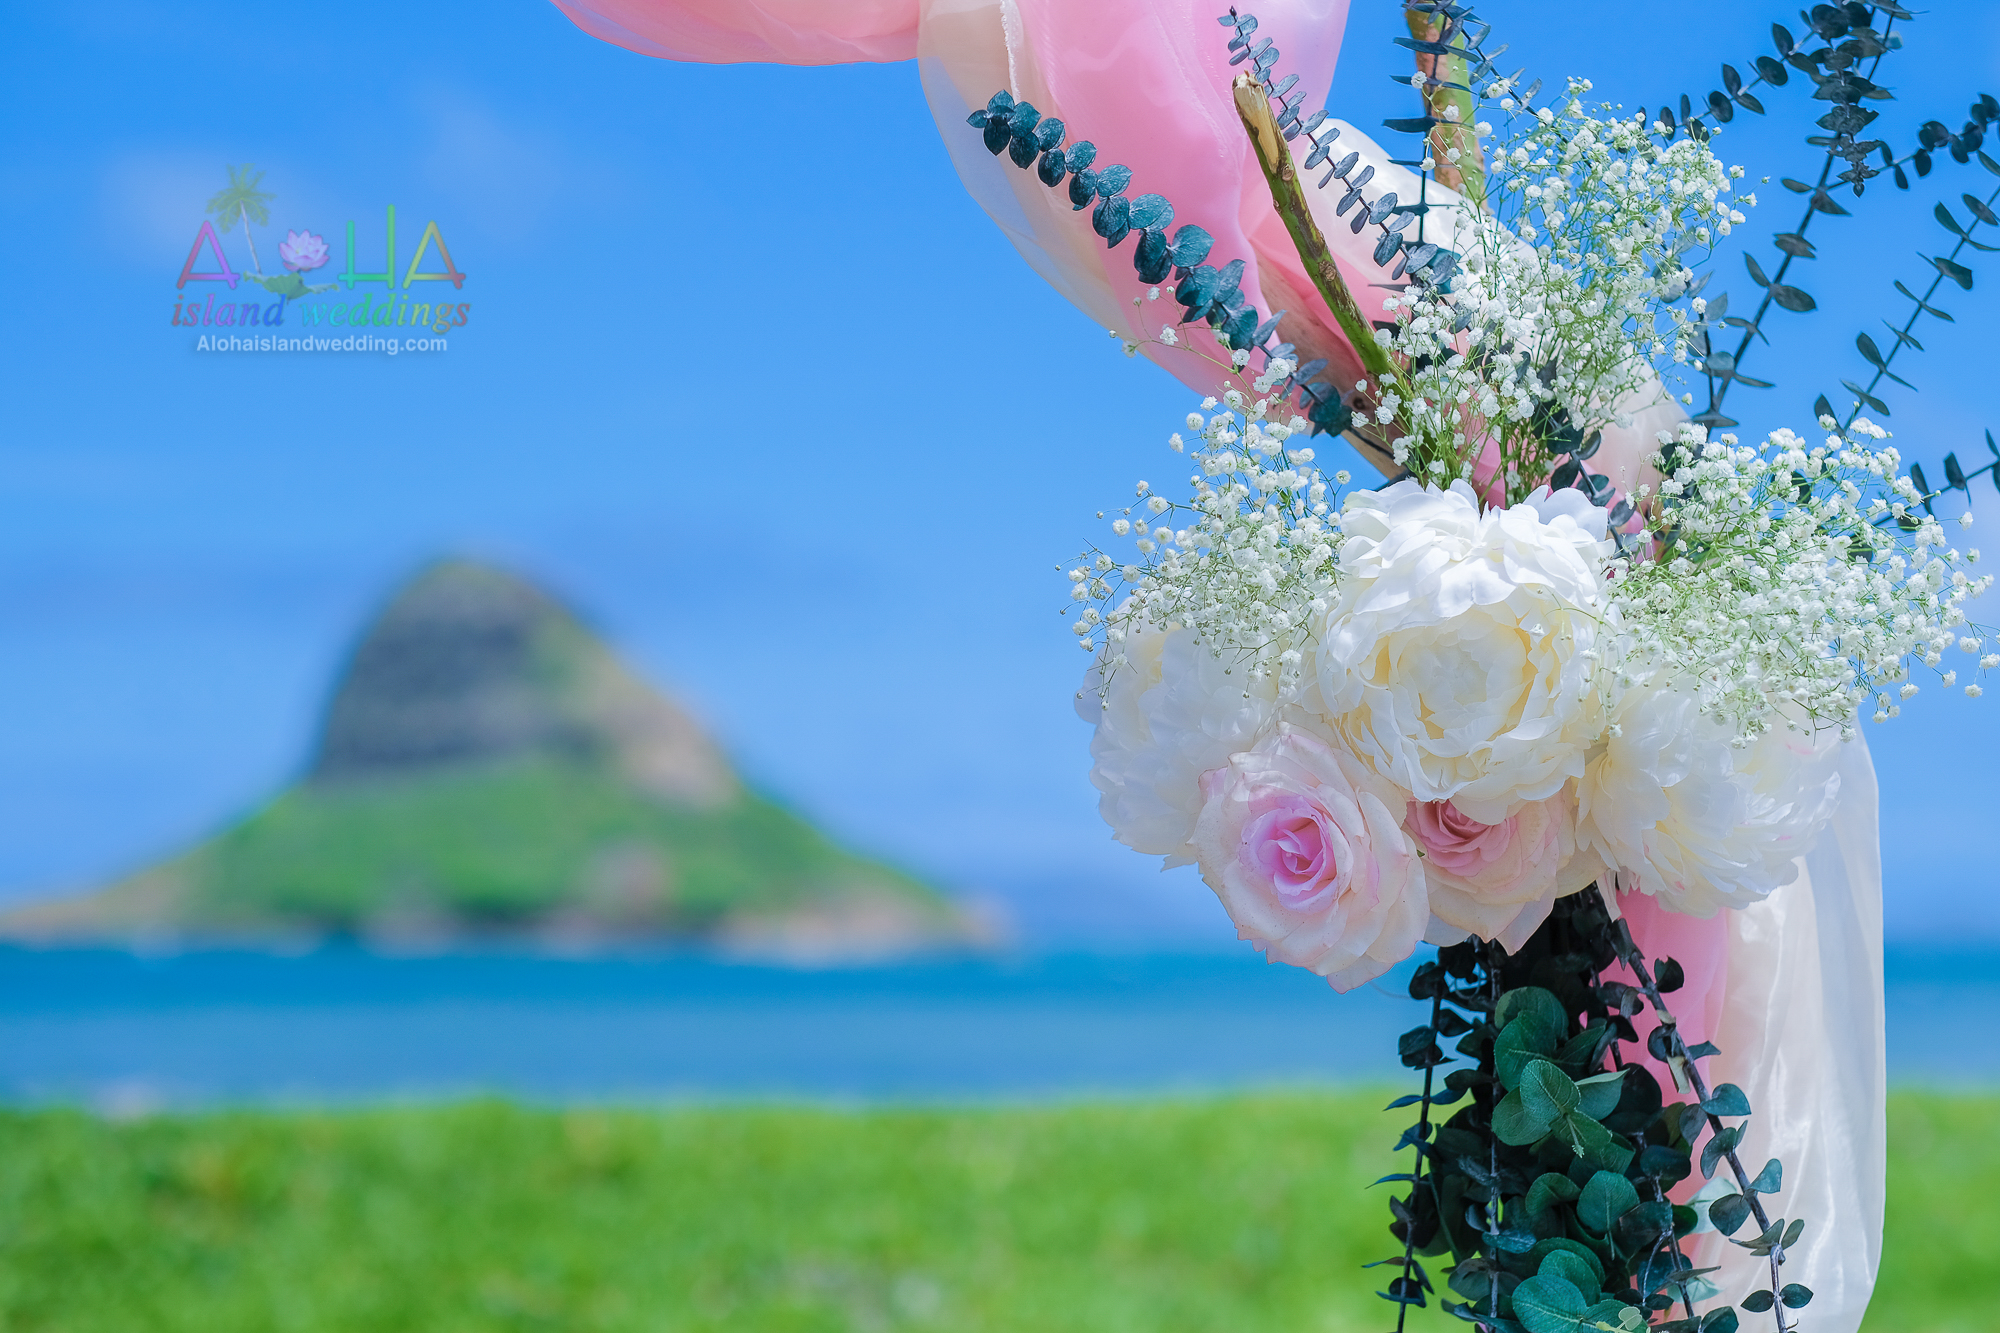 Hawaii weddings and events, Kualoa-31